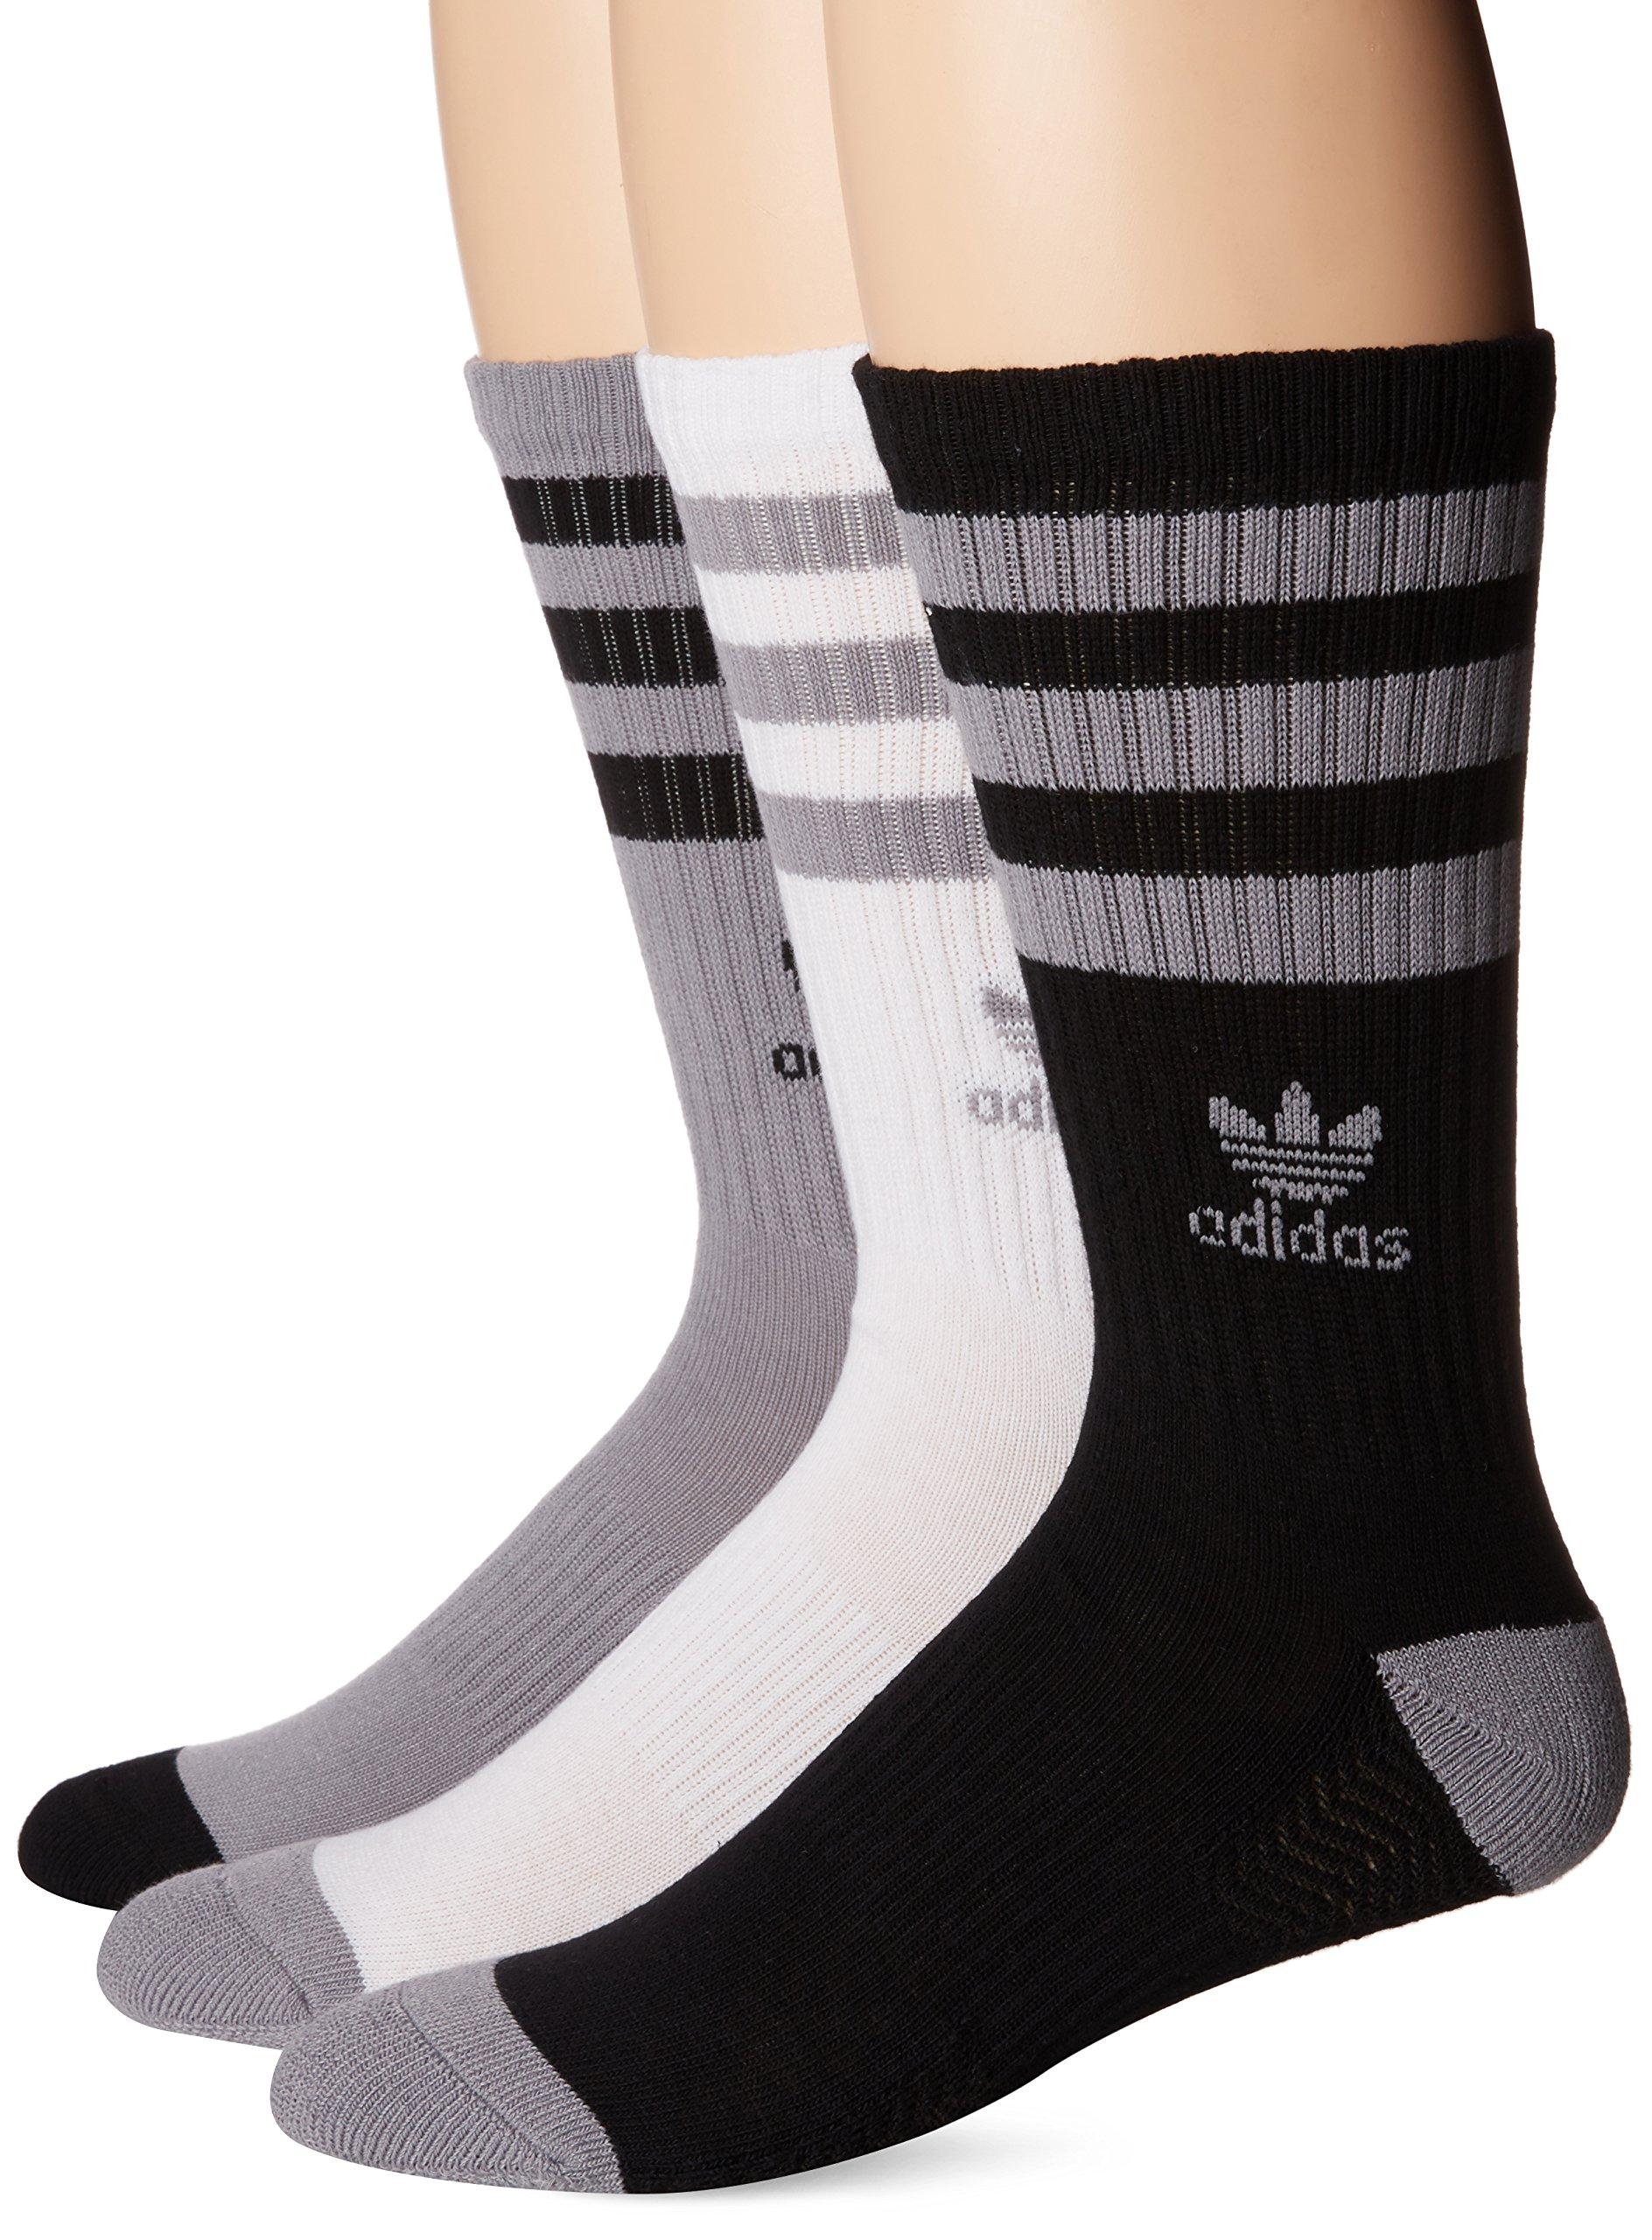 adidas Men's Originals Crew Socks (3-Pack), Light Onix/Black/White, Large